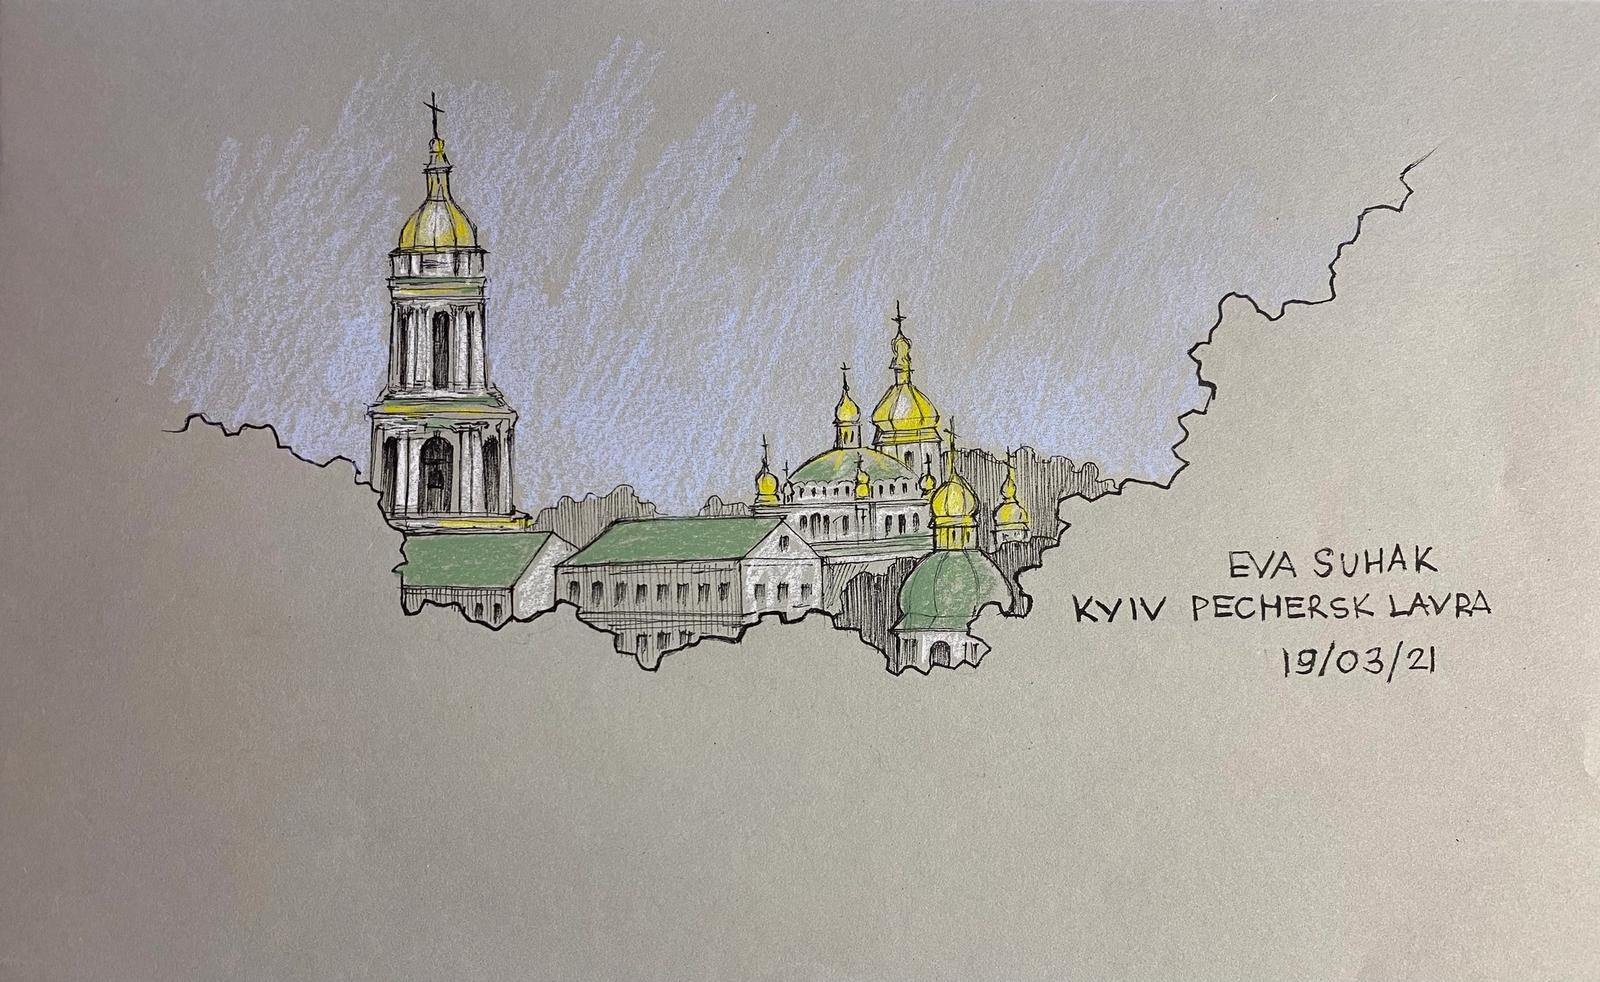 Kyiv-Pechersk Lavra - 2